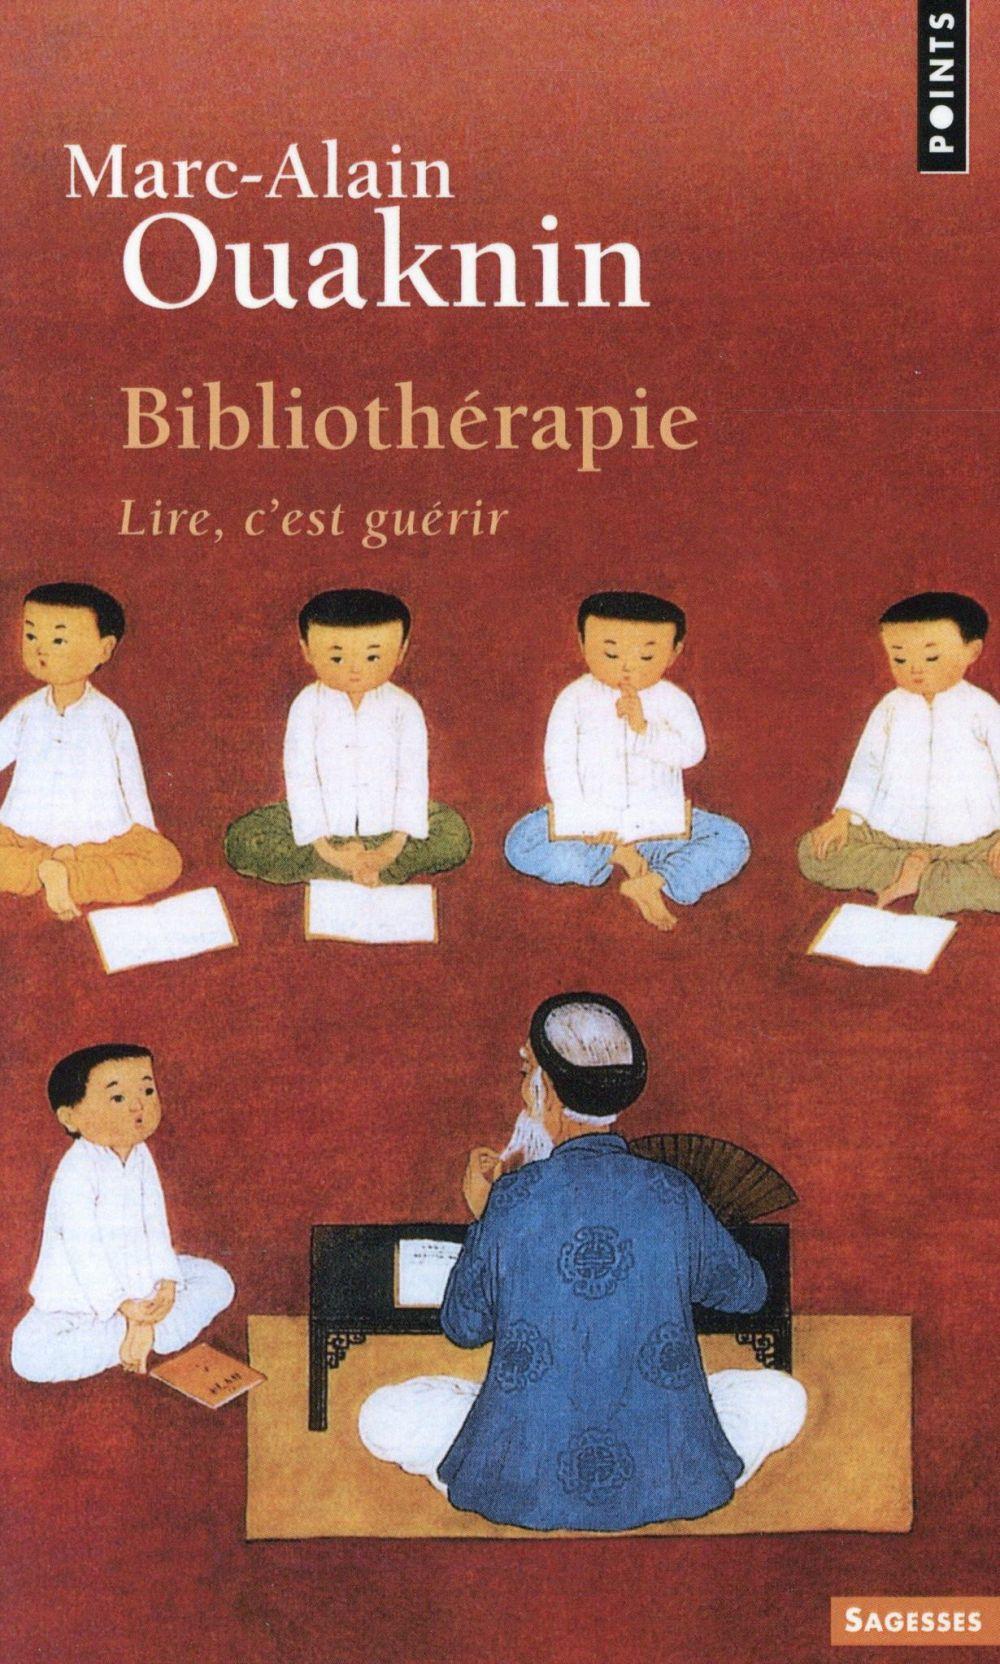 Bibliothérapie ; lire, c'est guérir